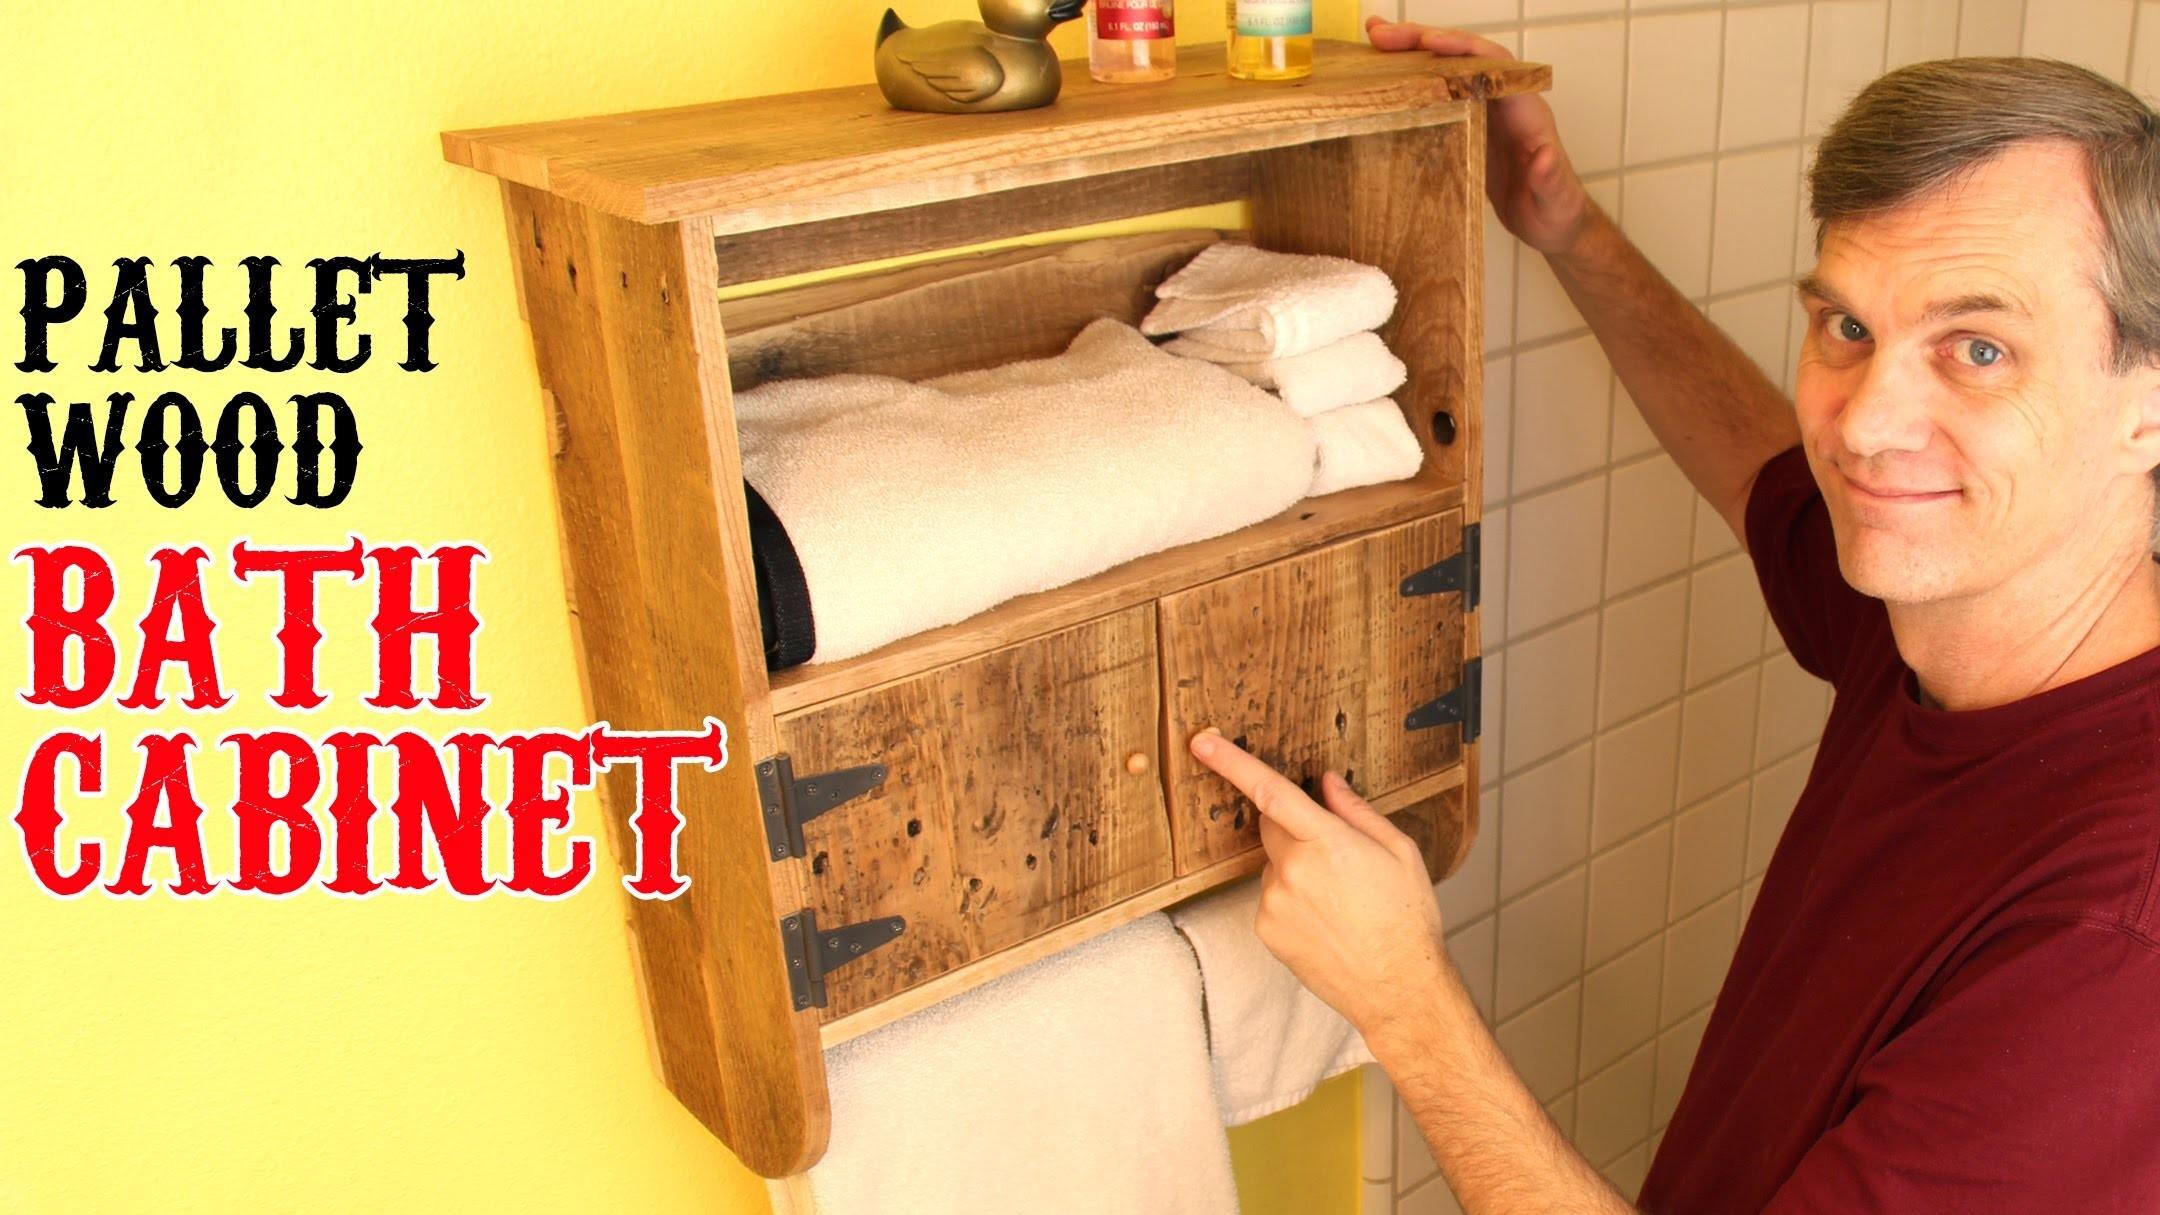 Rustic, pallet-wood bath cabinet. Unique charm for your bathroom.